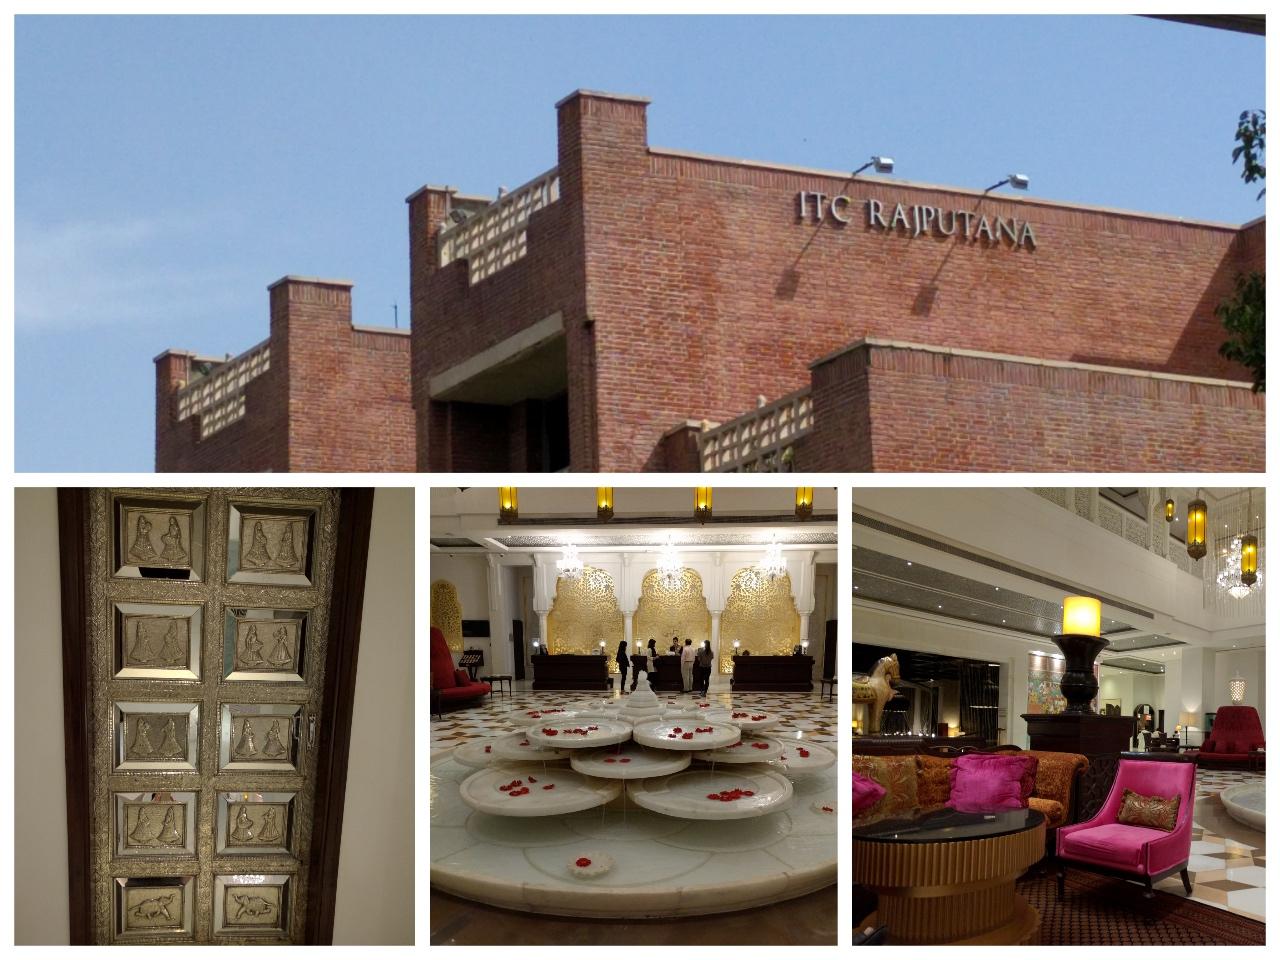 ITC Rajputana building, Silver door, Reception area and Lobby